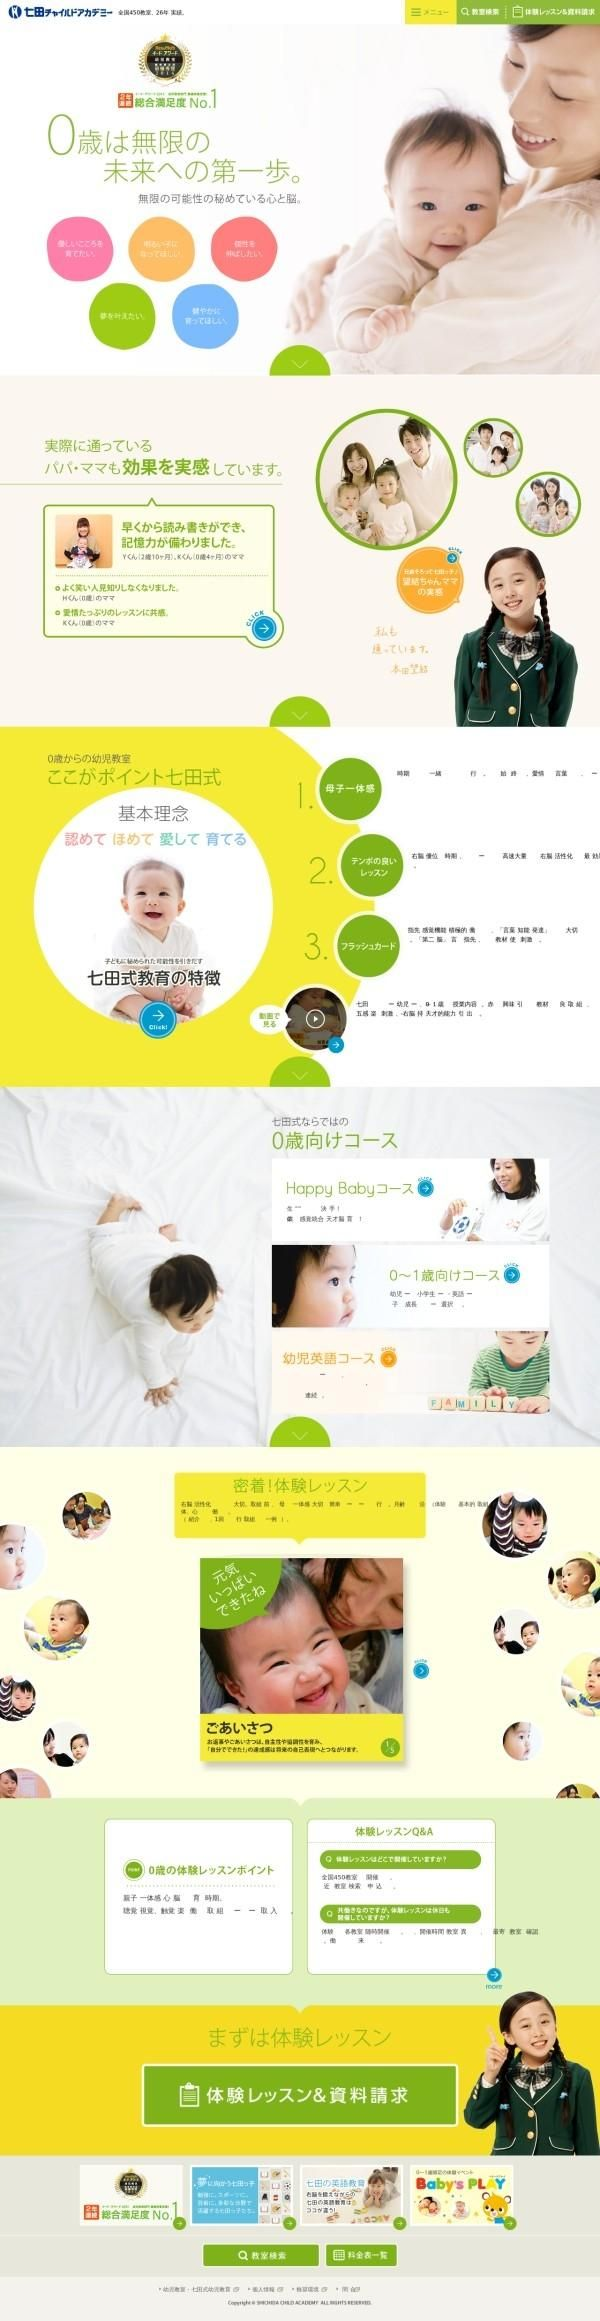 Screenshot http://baby.shichida.ne.jp/age_0/index.html - created on 2016-05-17 08:42:14